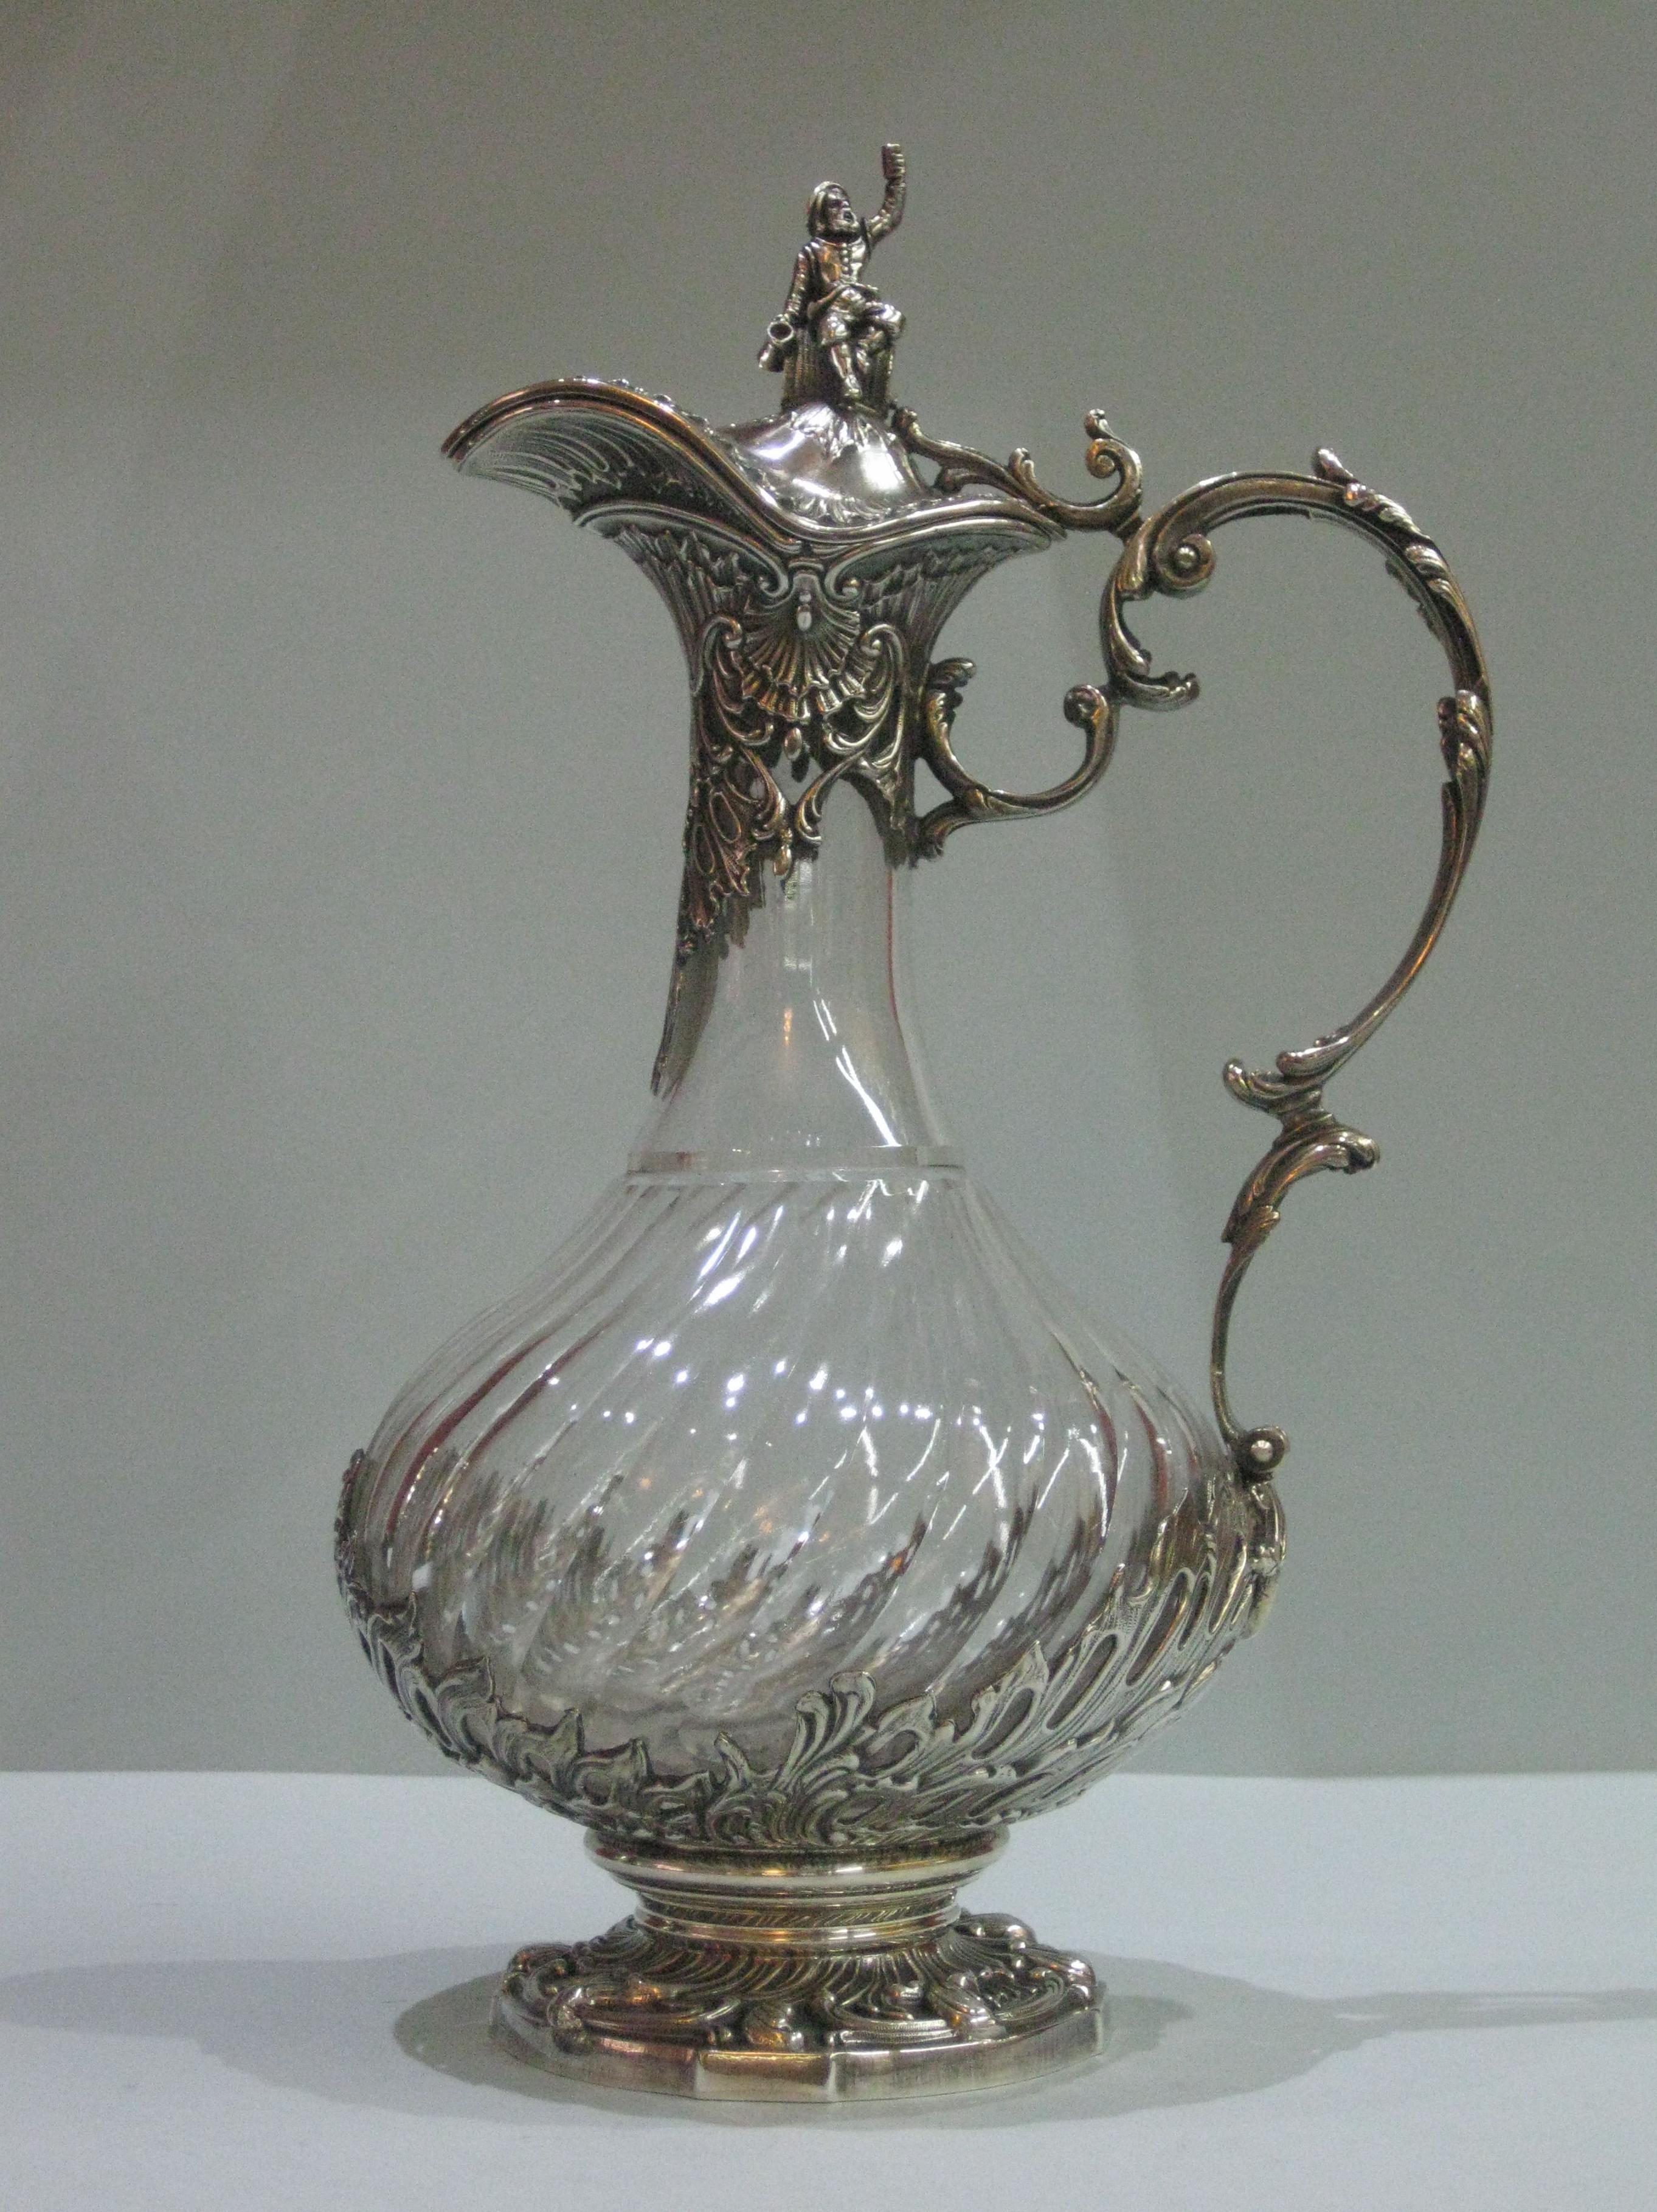 JARRA CRISTAL Y PLATA: Catalogo de plata de Vera Orfebre